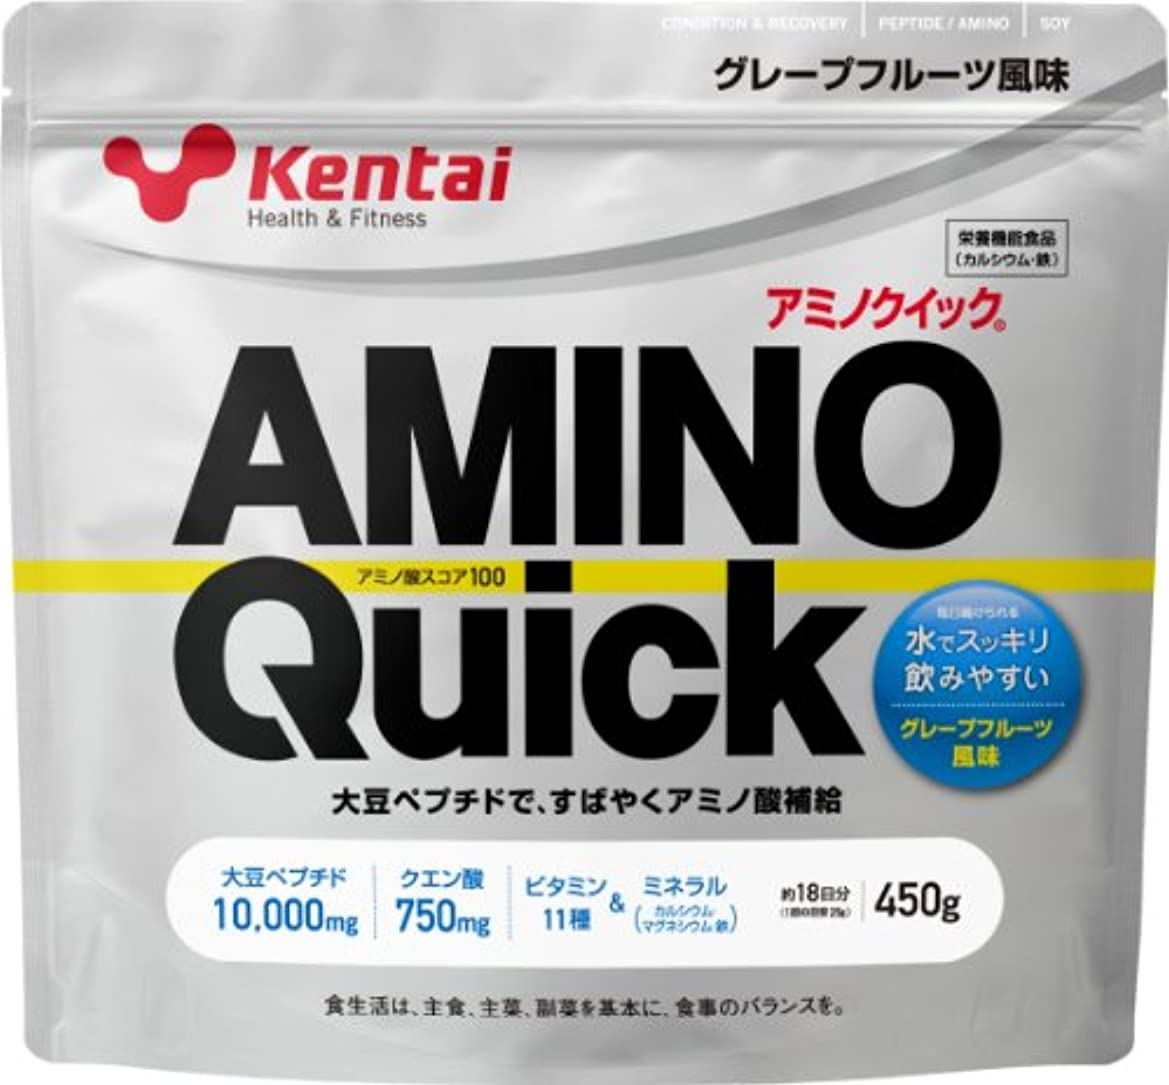 Kentai アミノクイック グレープフルーツ 450g